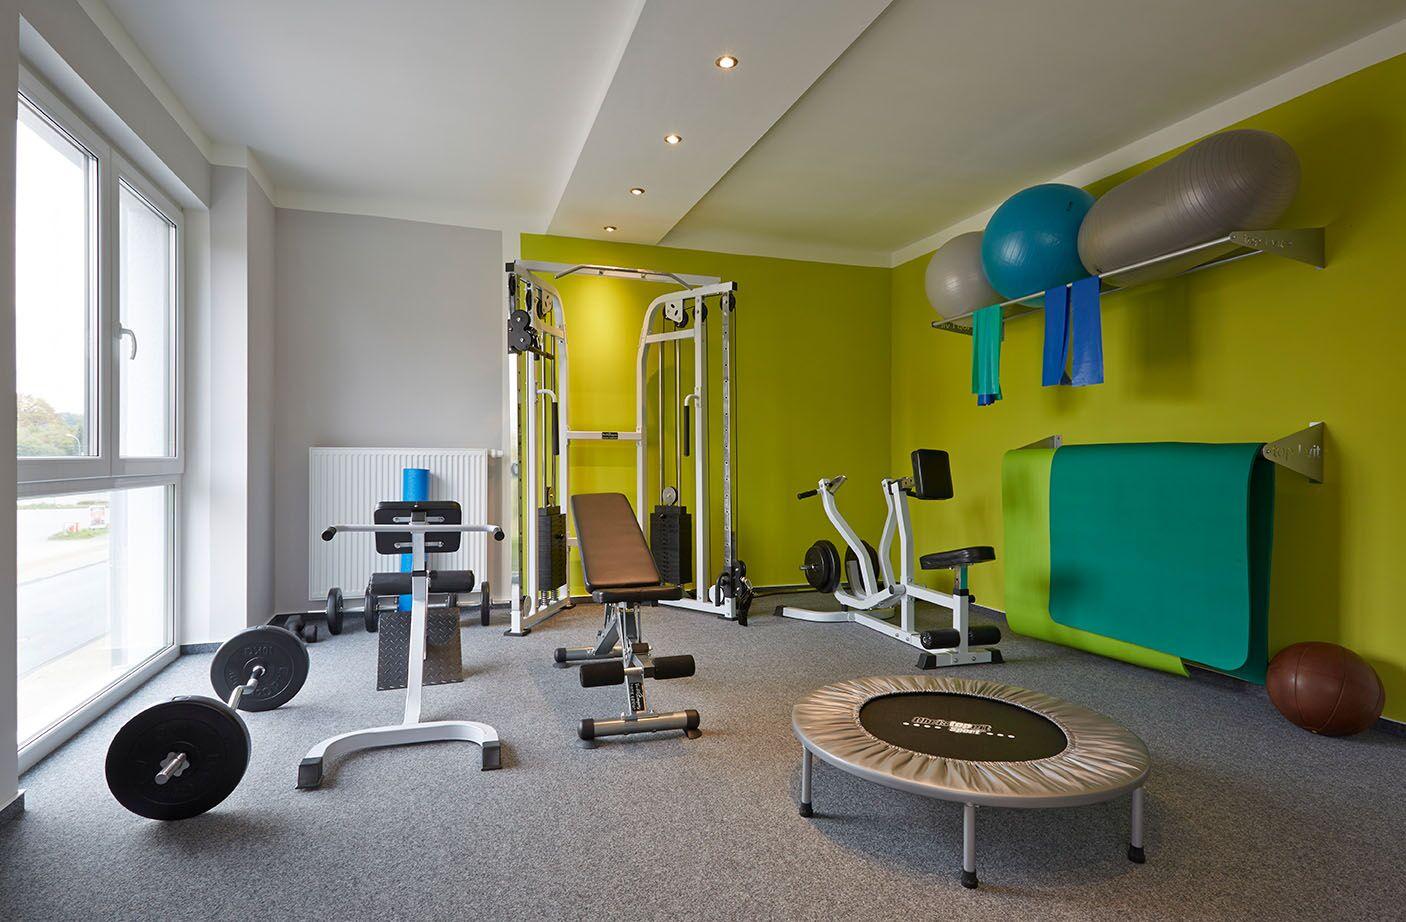 Raum mit Fitnessgeräten